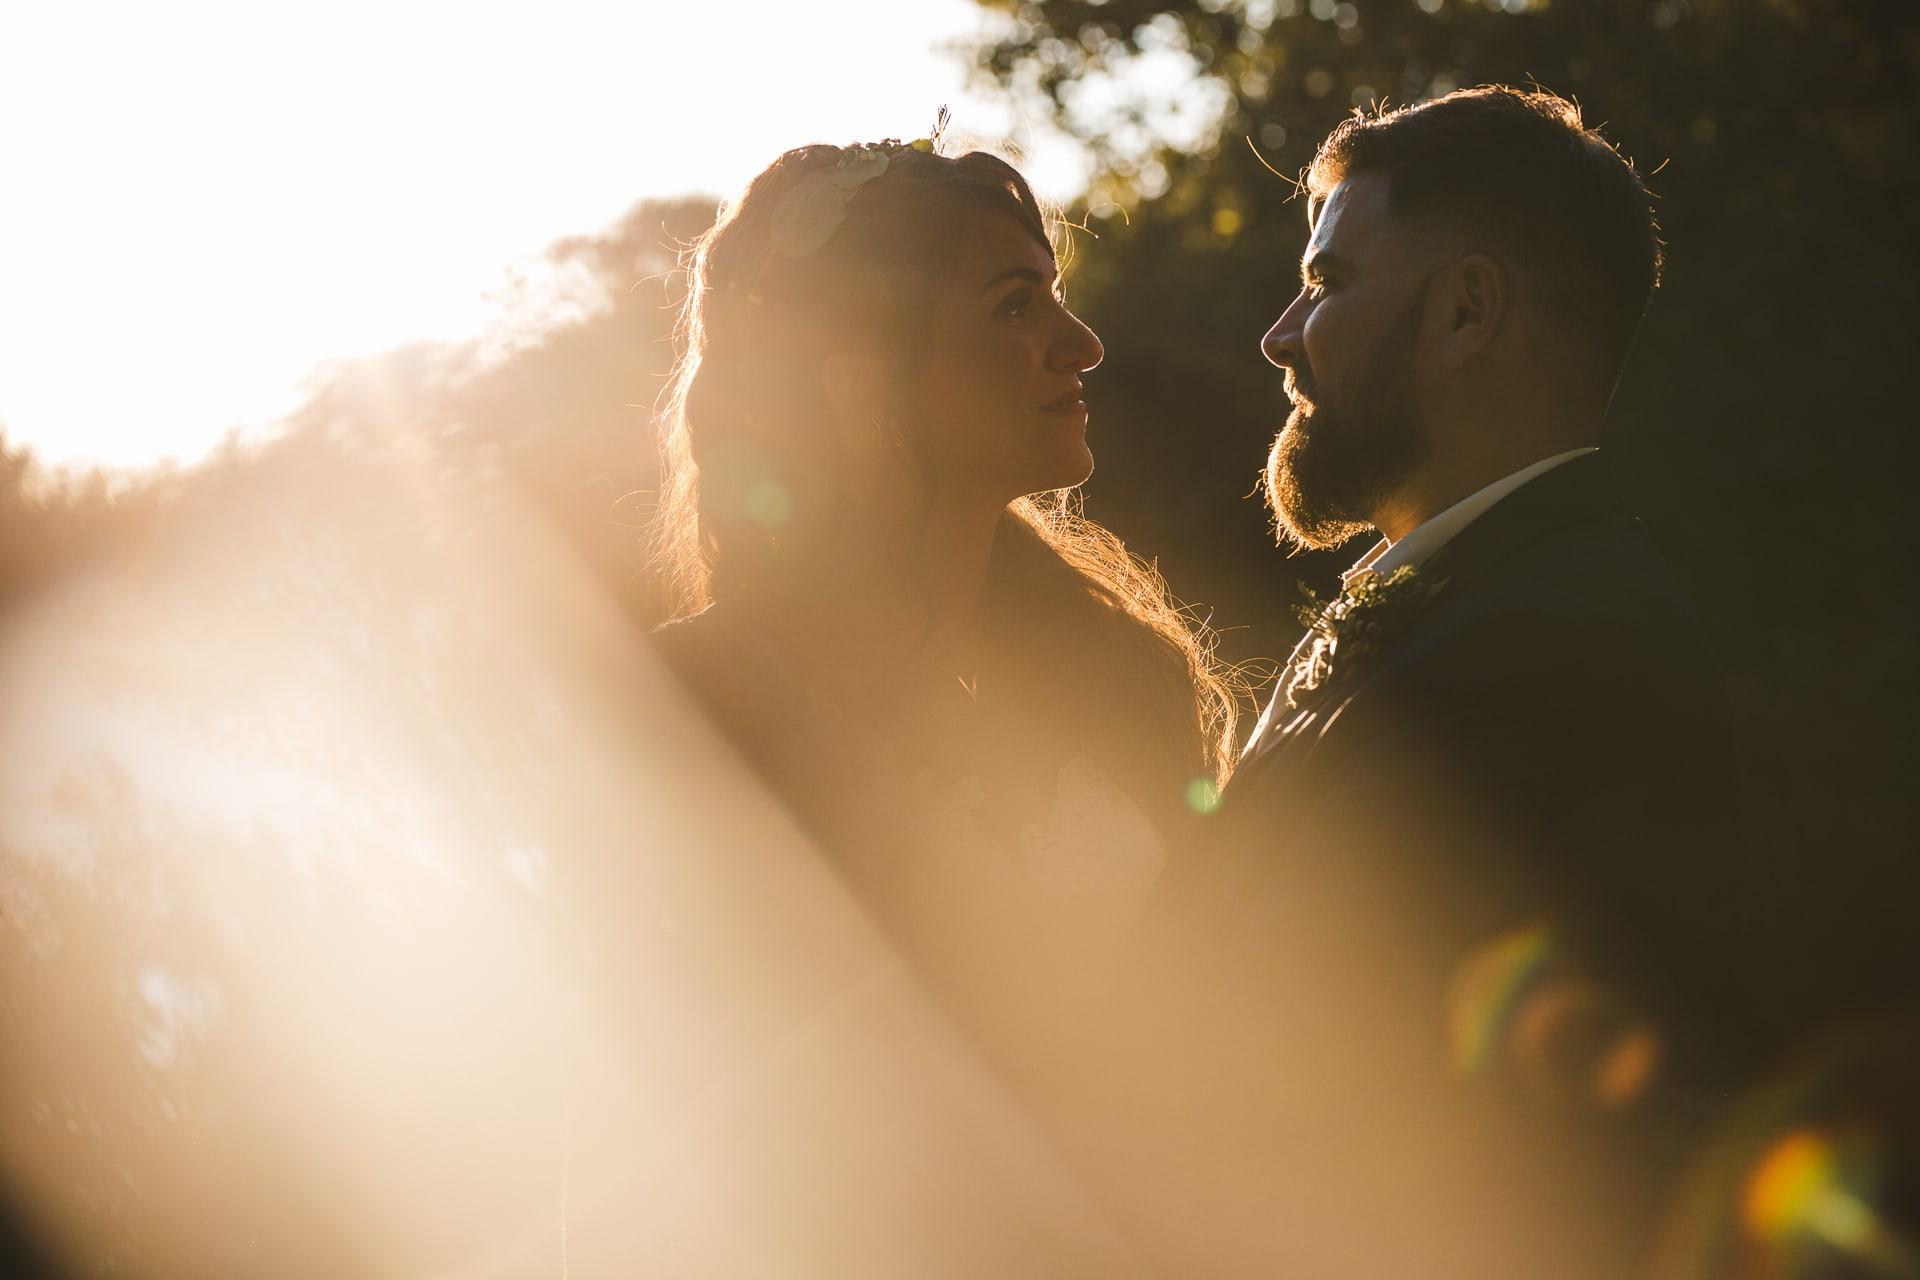 Contre jour, mariés se regarde, mariage moody